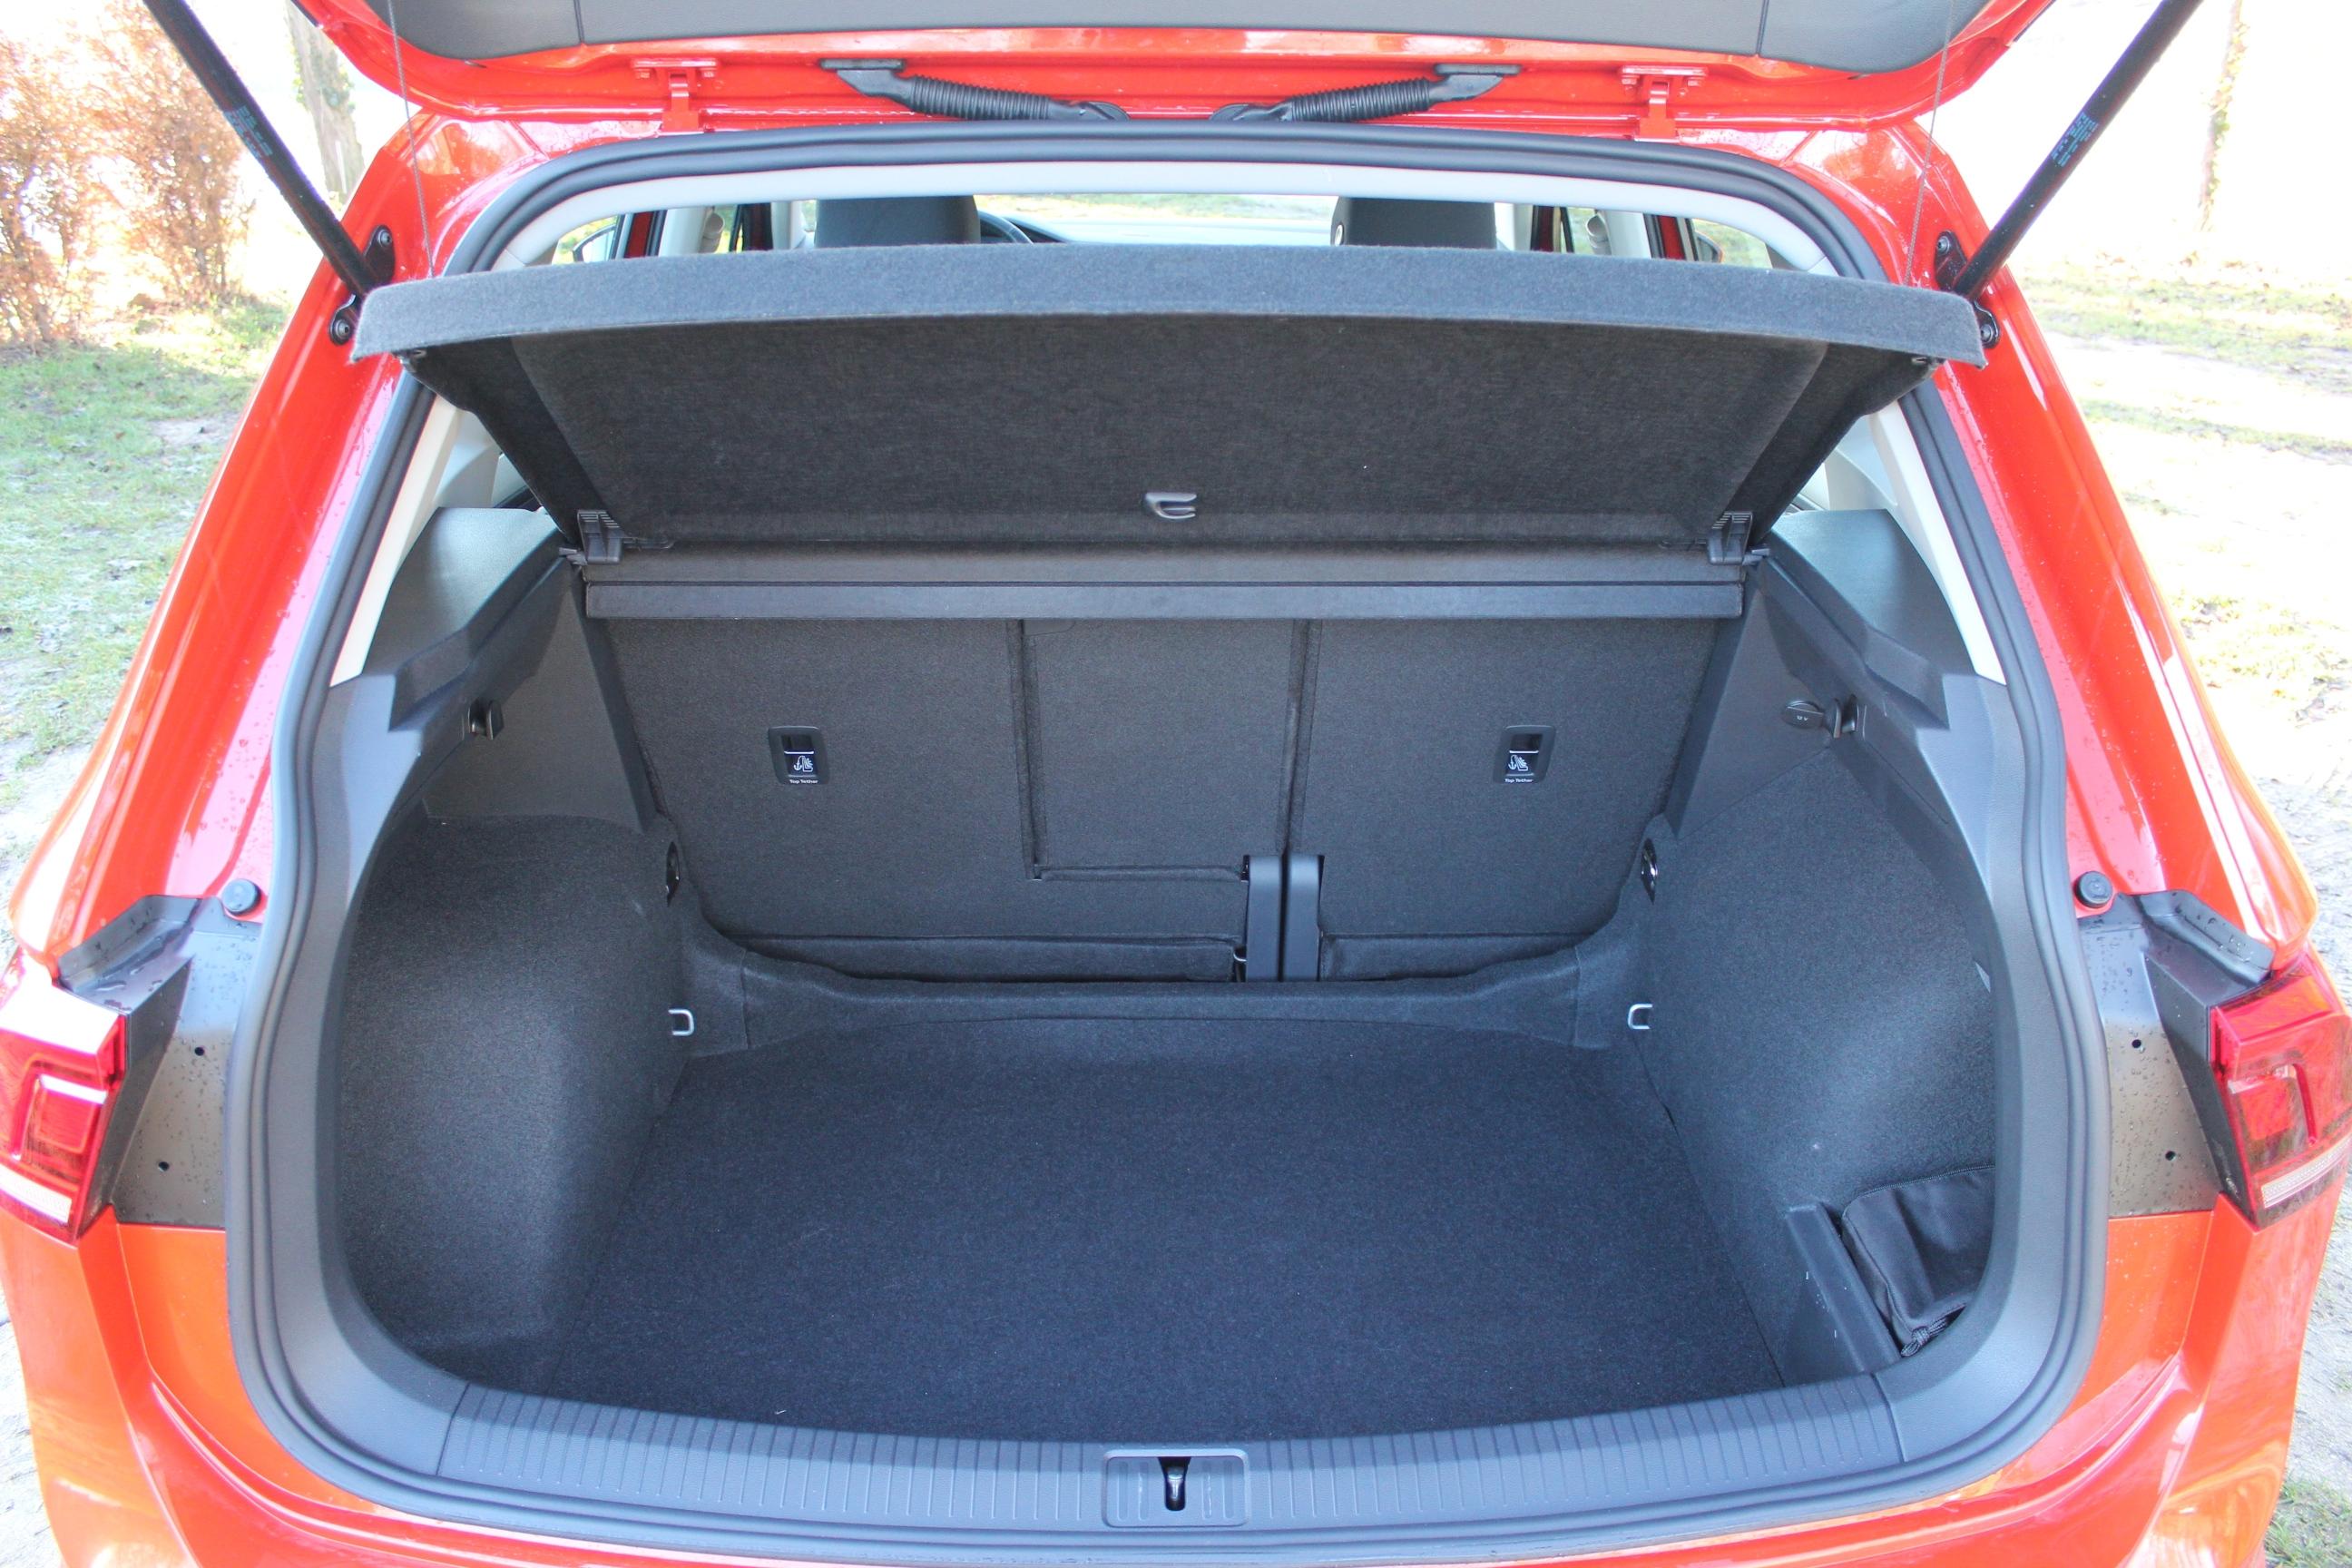 essai volkswagen tiguan 1 4 tsi 125 entr e de gamme convaincante. Black Bedroom Furniture Sets. Home Design Ideas